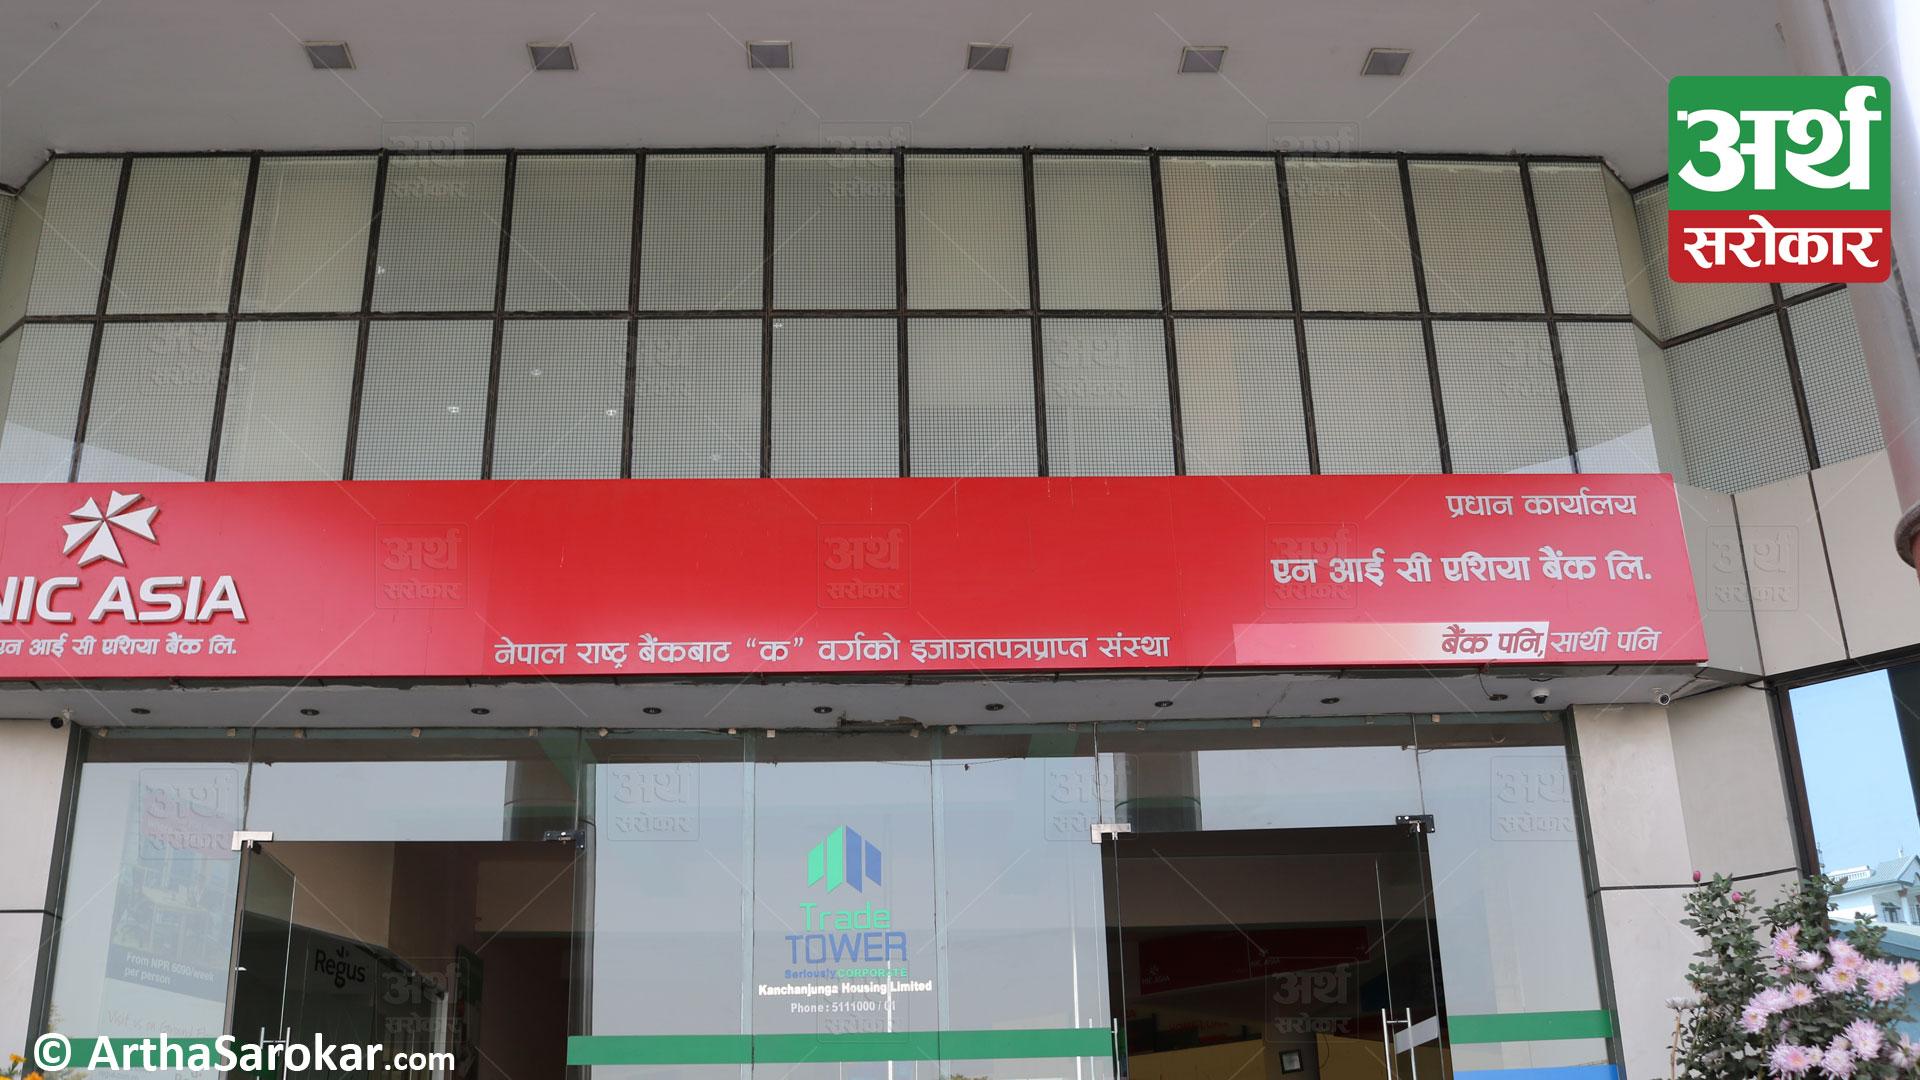 NIC Asia Bank donates three concentrator machines to Tokha Municipality